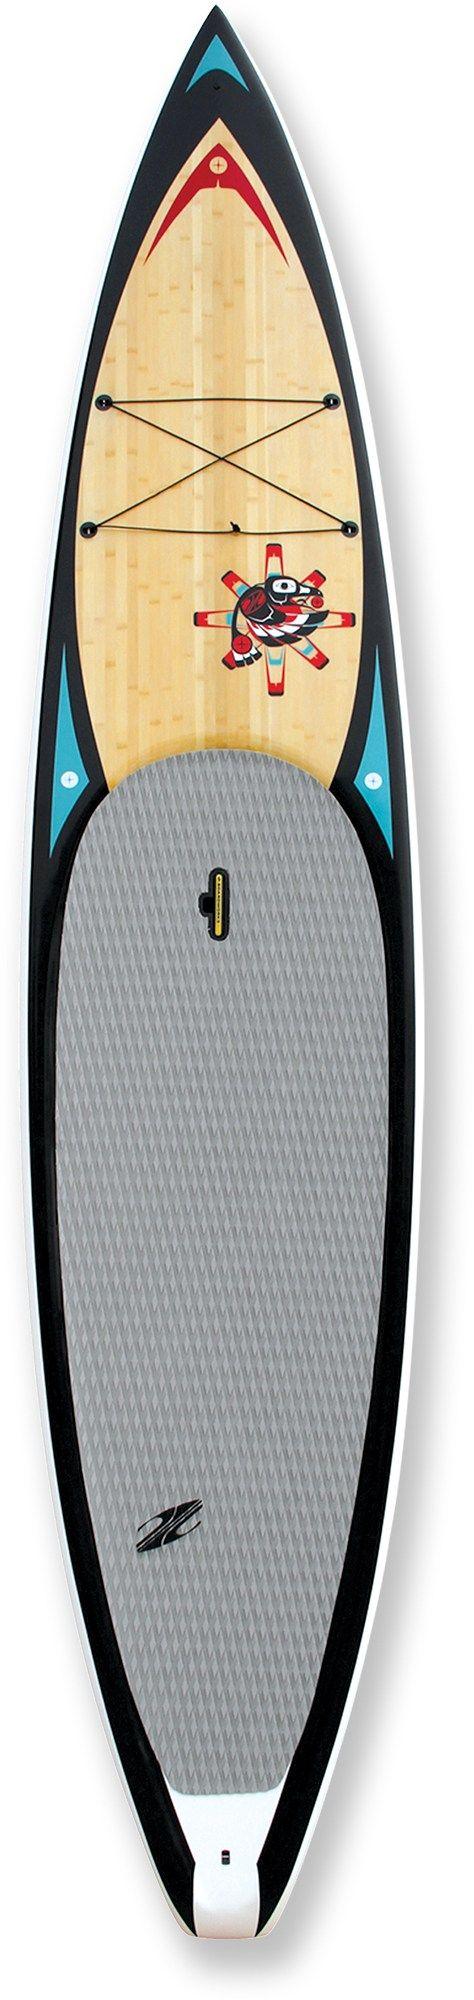 Deppen custom wood canoe paddles - Boardworks Raven Stand Up Paddle Board 11